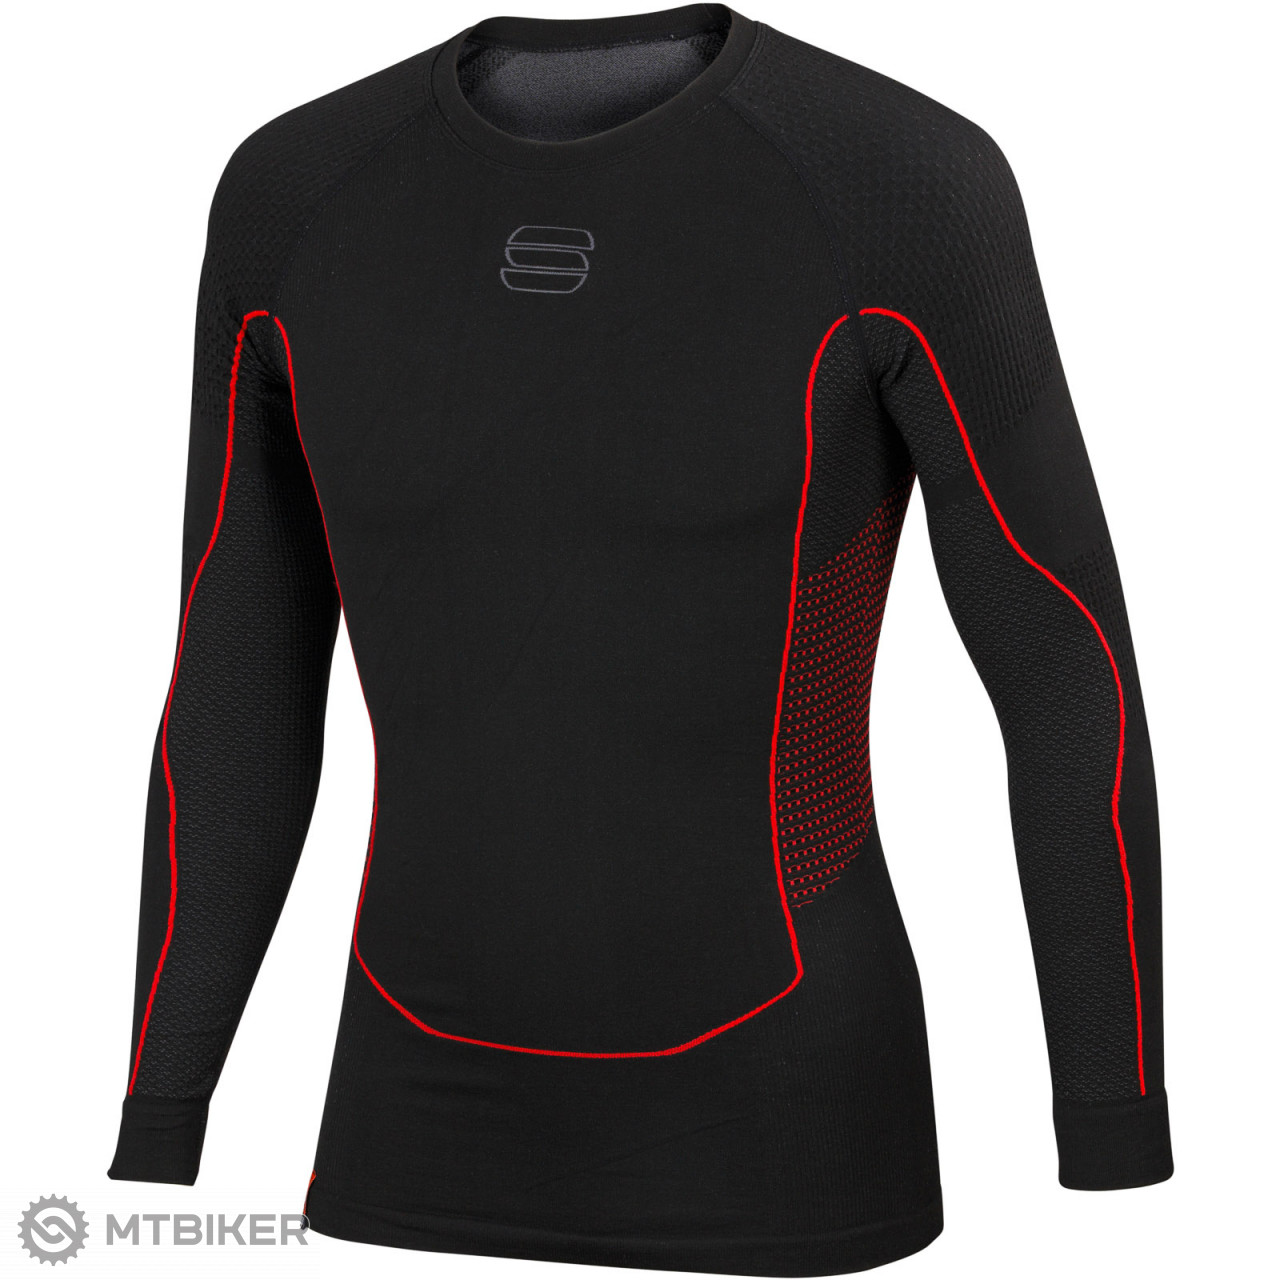 04d712a9cd0c Sportful 2nd Skin Tričko s dlhým rukávom čierne - MTBIKER Shop